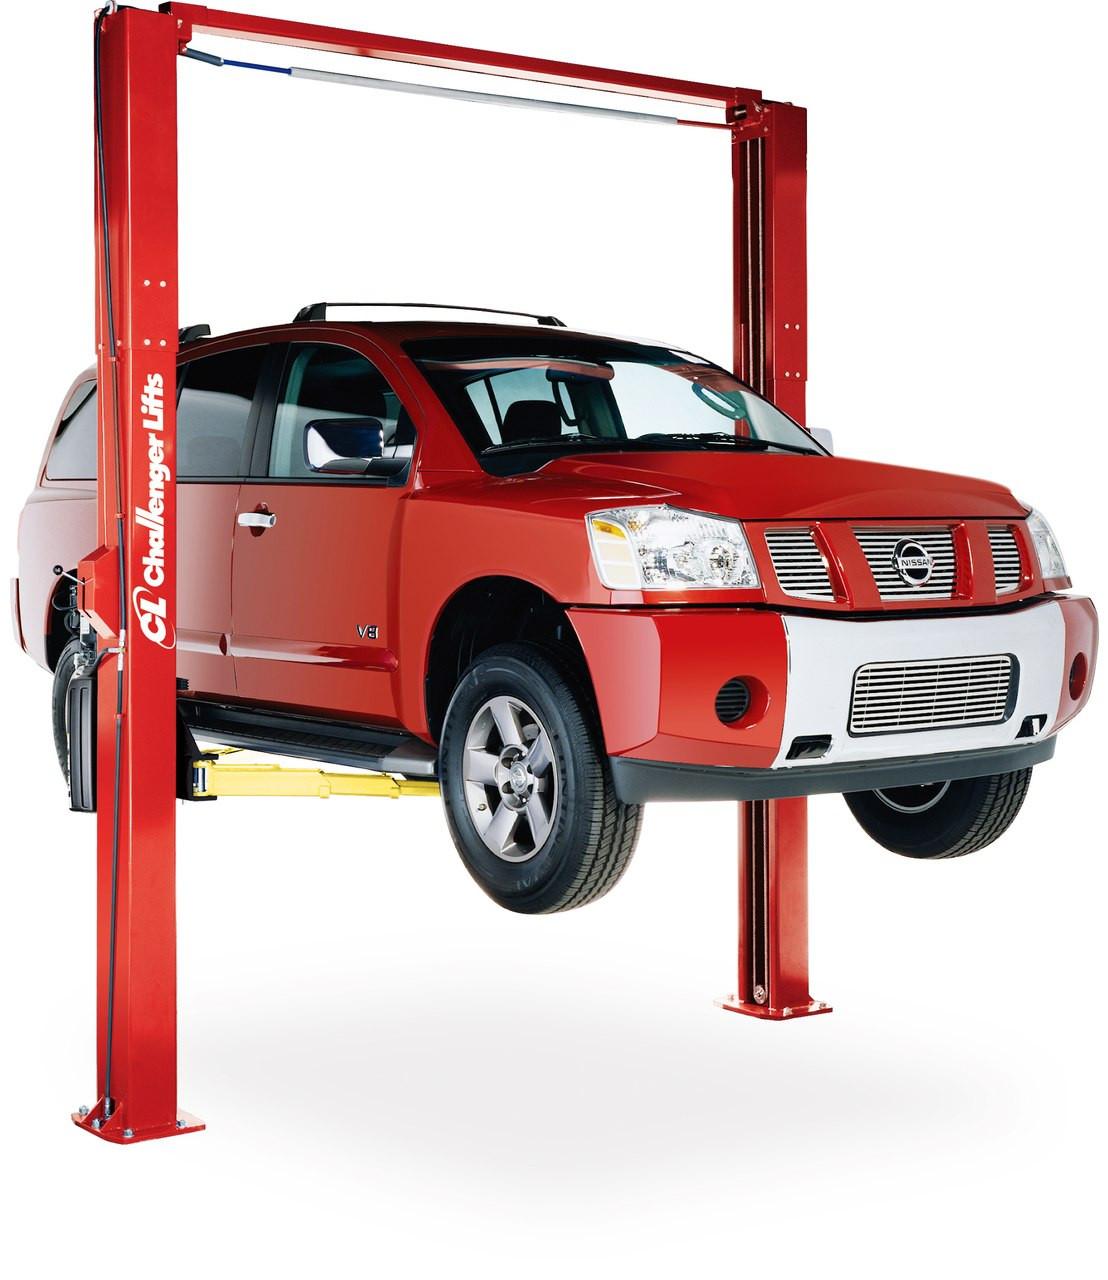 challenger lifts le10 symmetric asymmetric two post car lift rh jmcautomotiveequipment com challenger lift parts manual challenger e10 lift manual